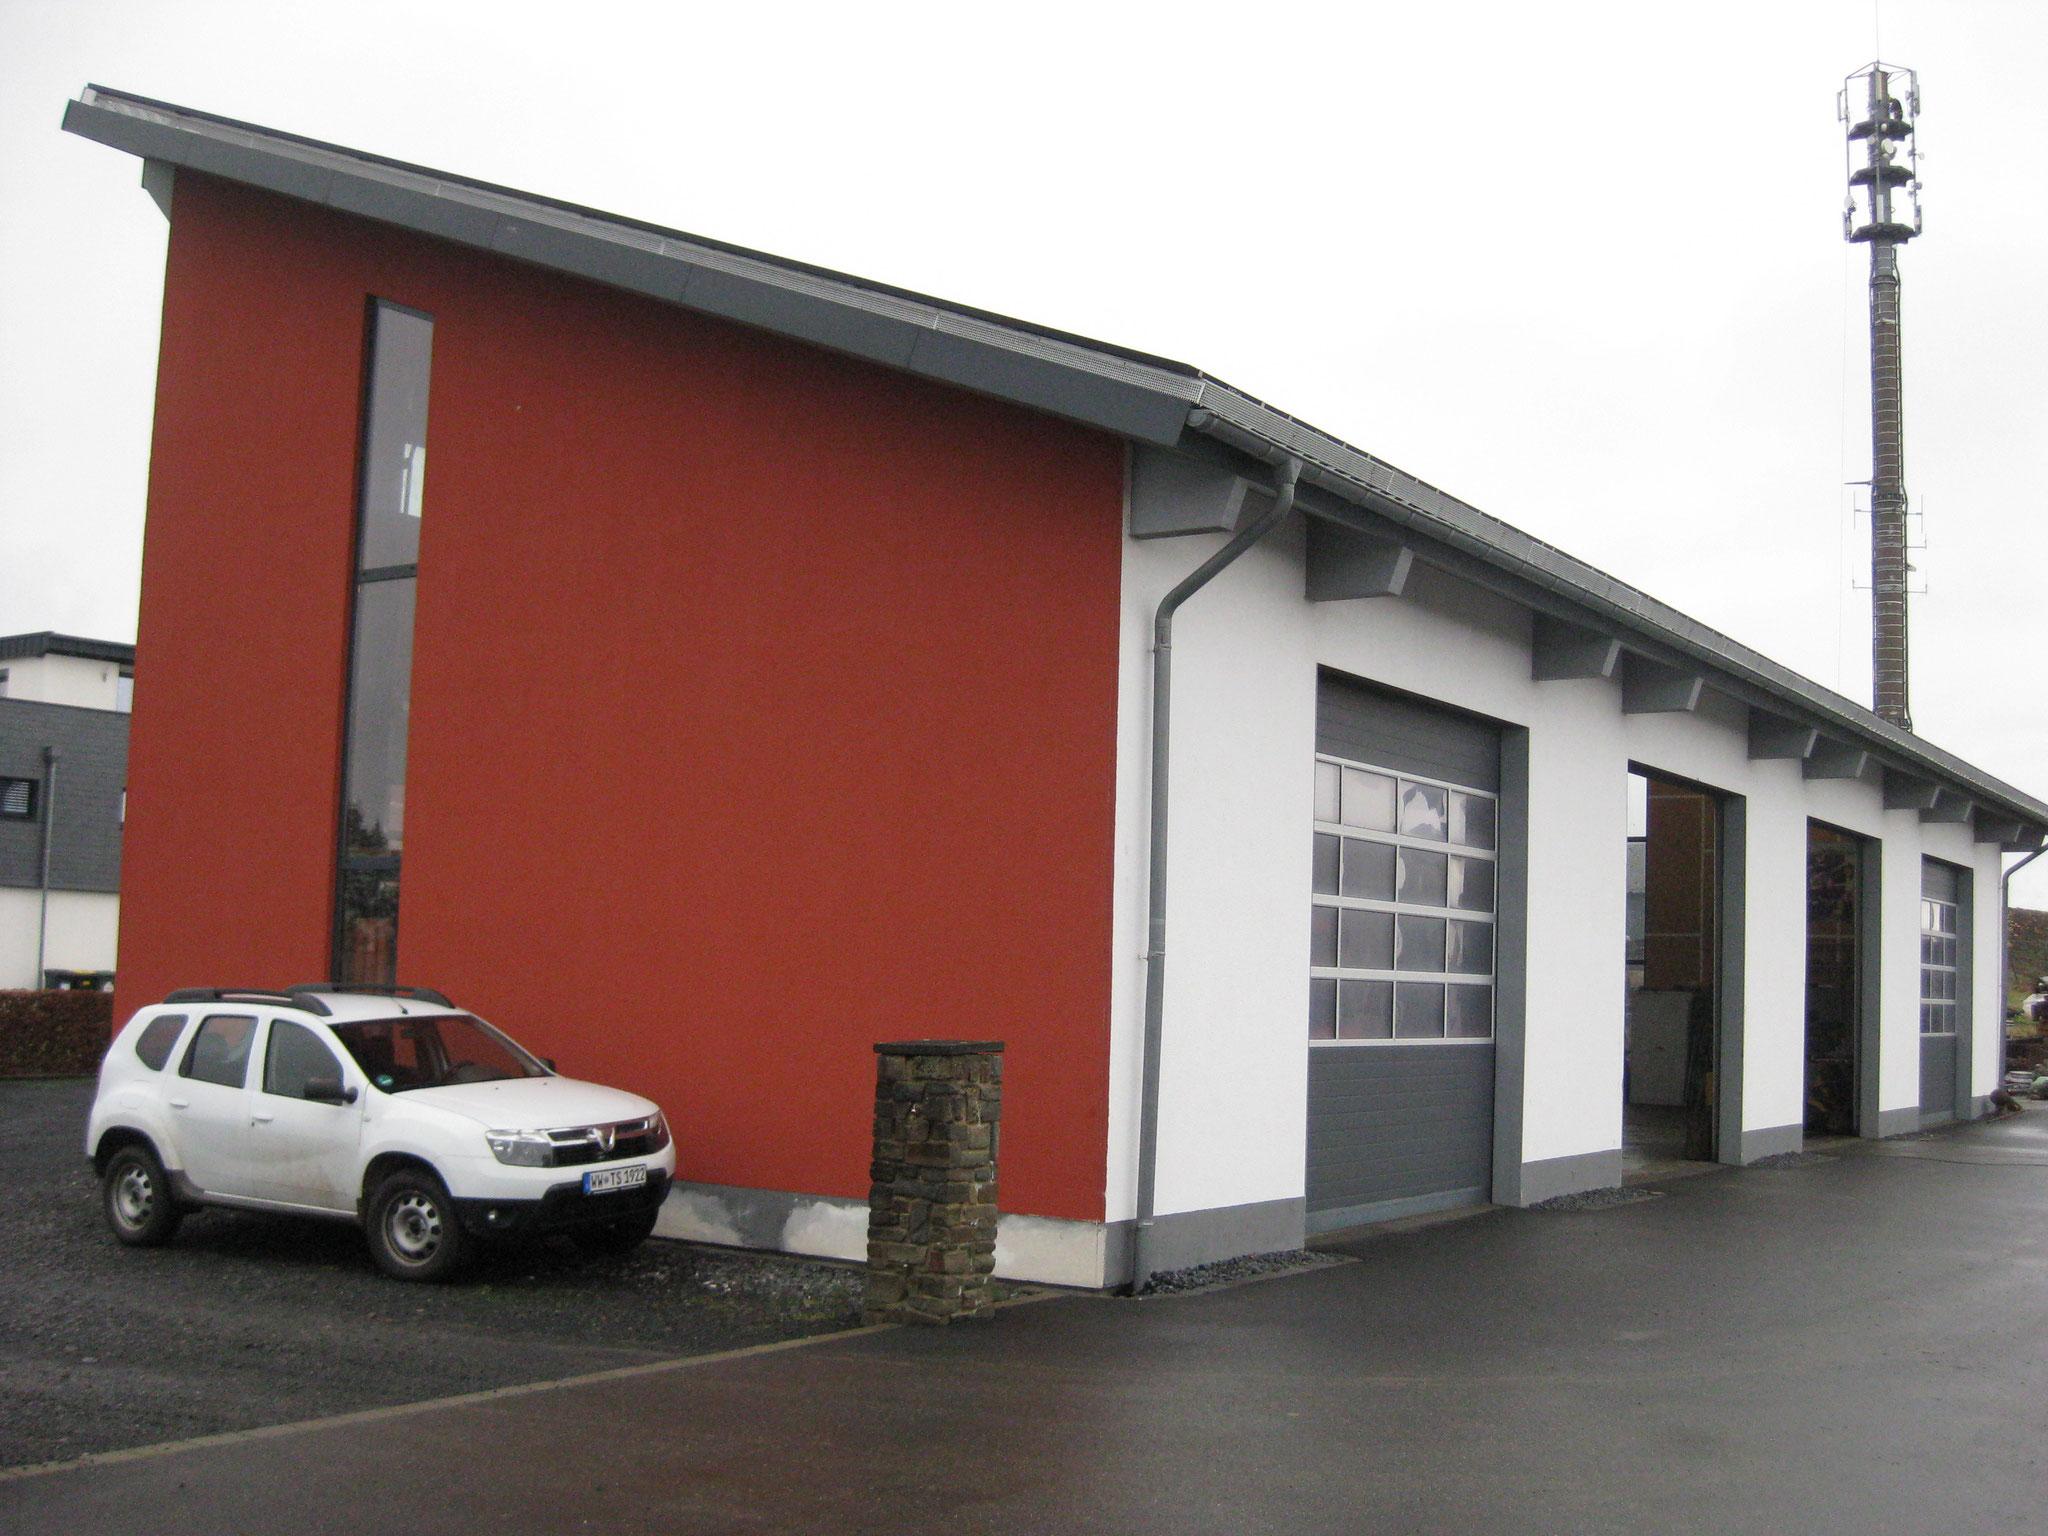 Gartenbau Daimling: Halle in Holzrahmenbauweise